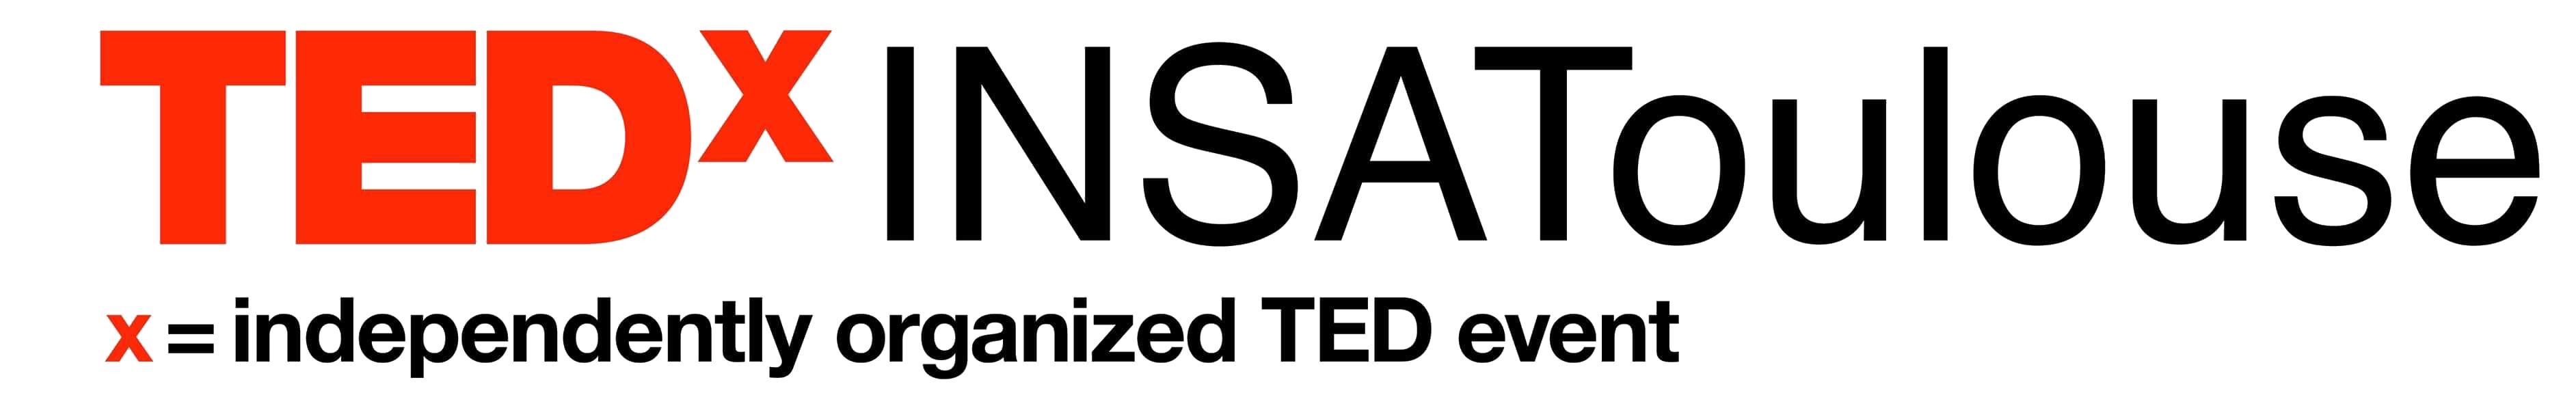 Logo du club TEDxINSAToulouse